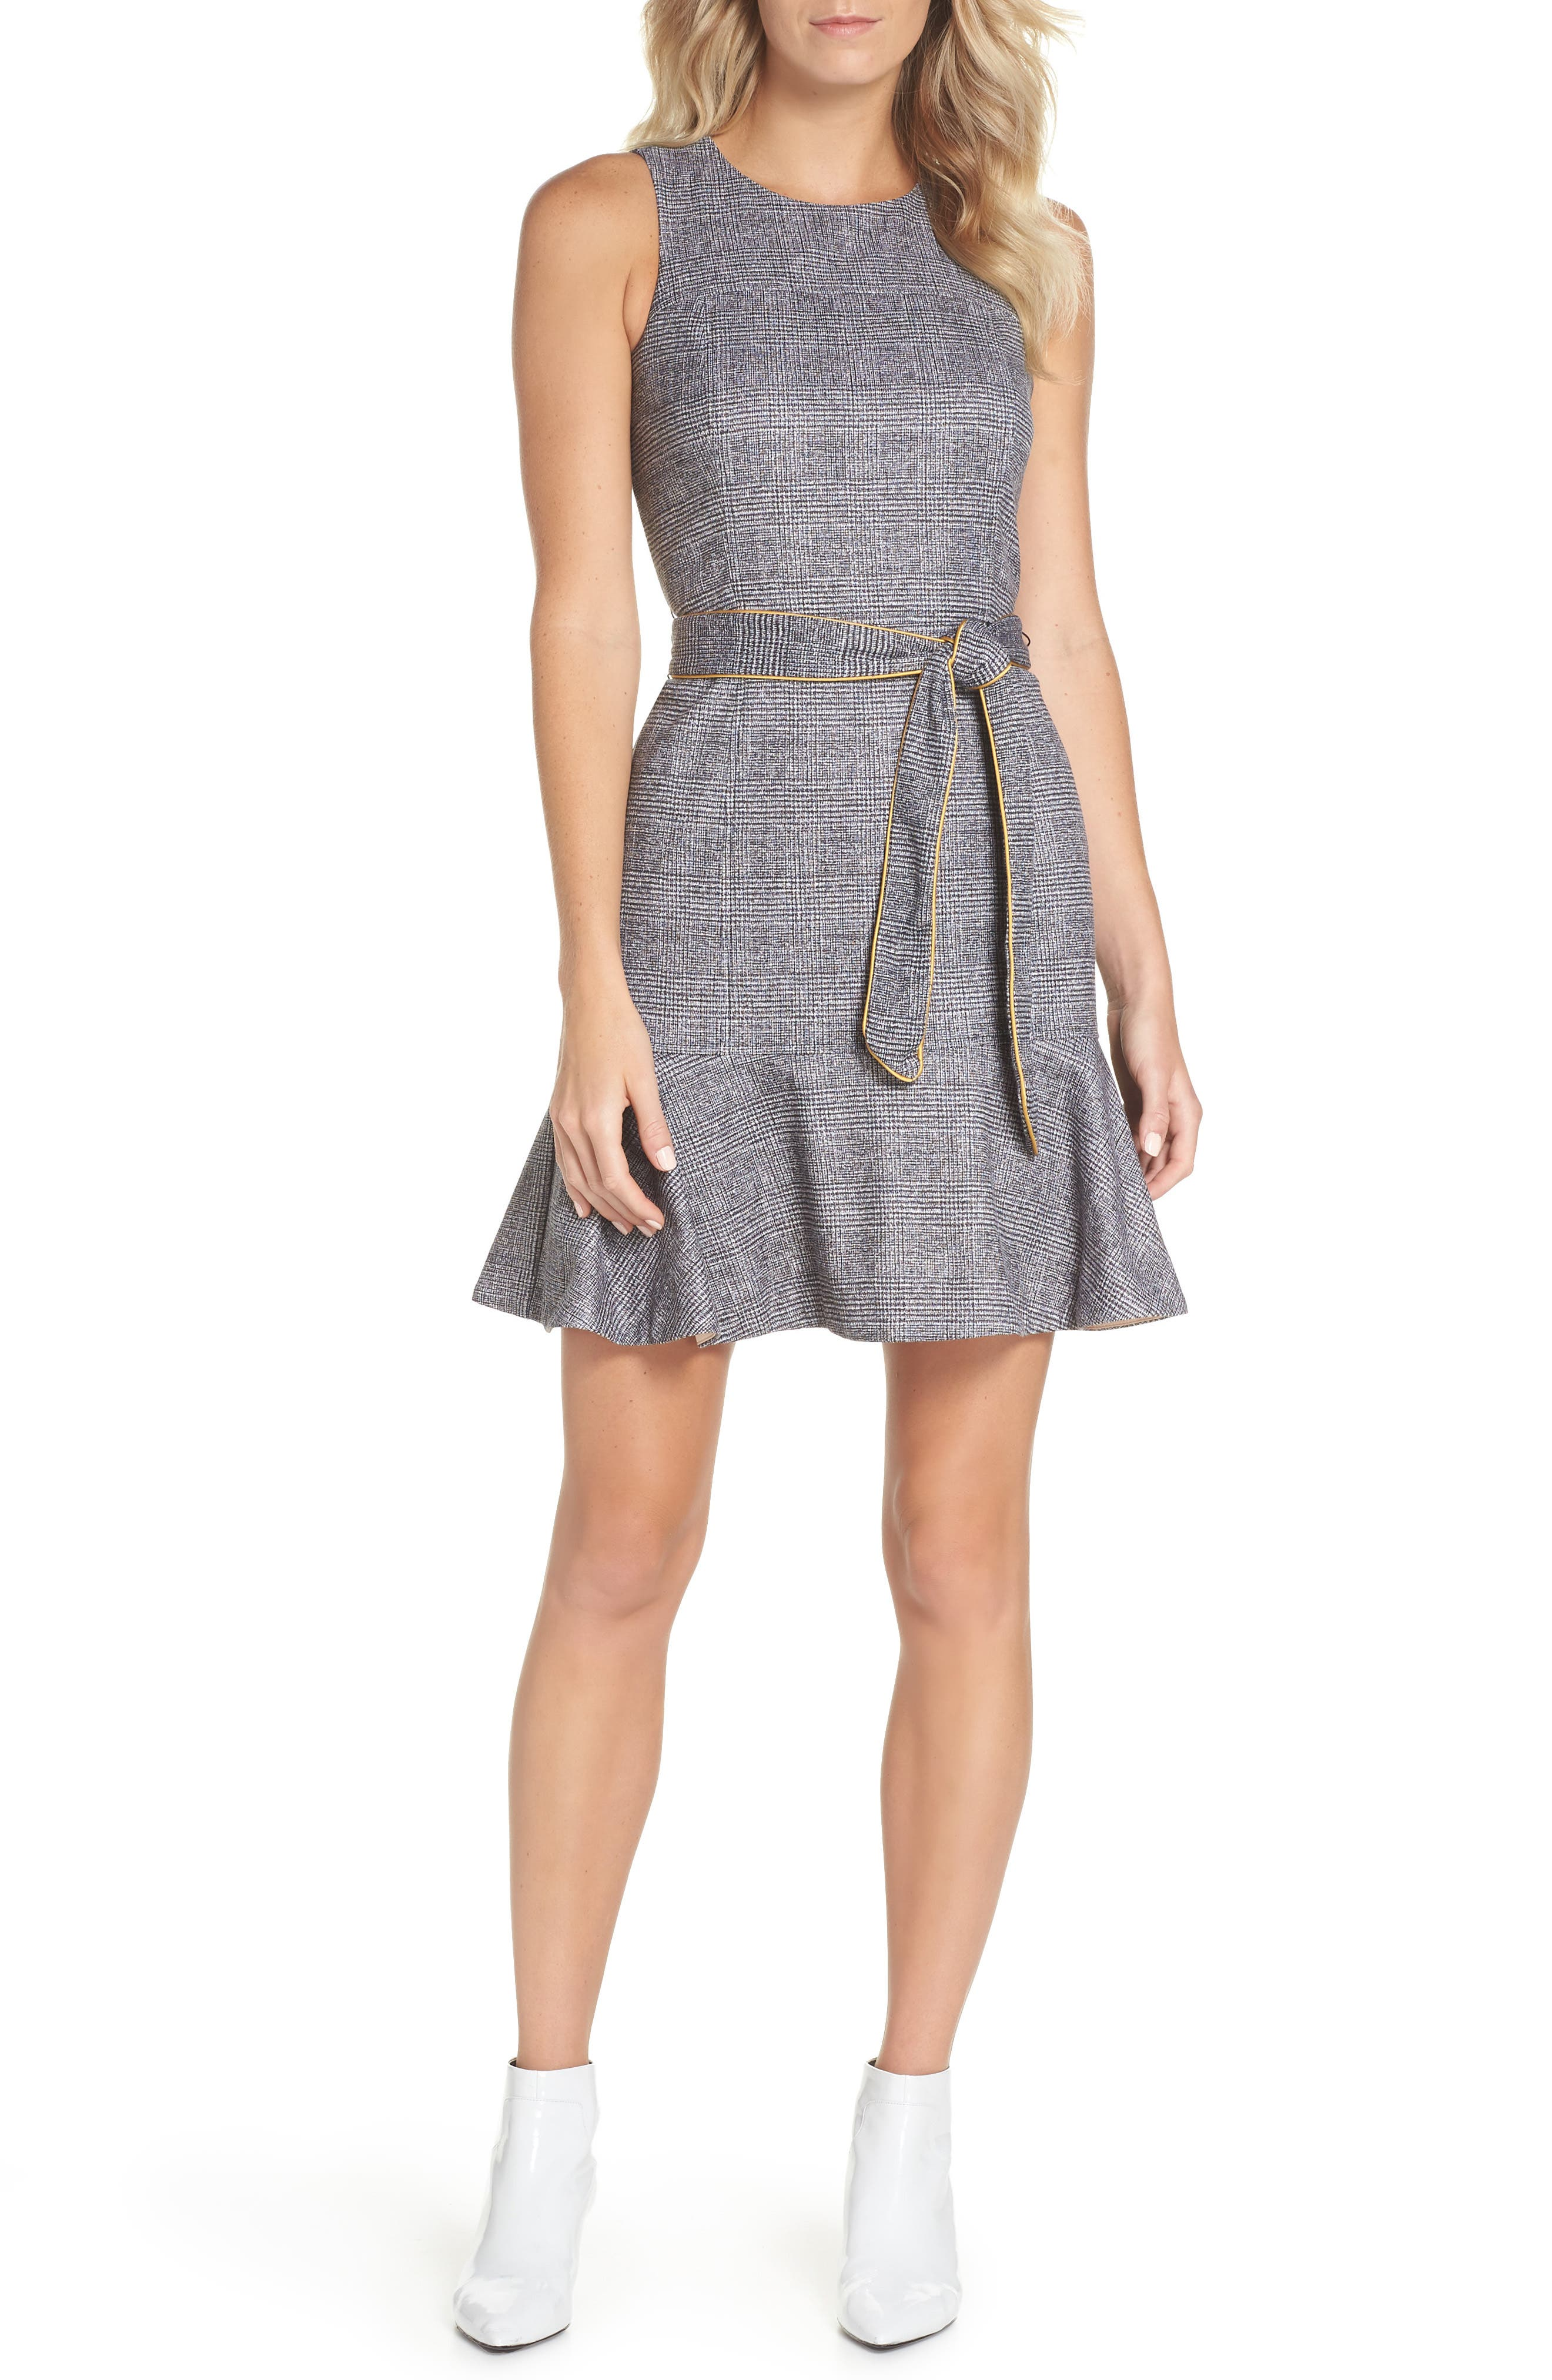 CHELSEA28 Sleeveless Plaid Dress, Main, color, 001